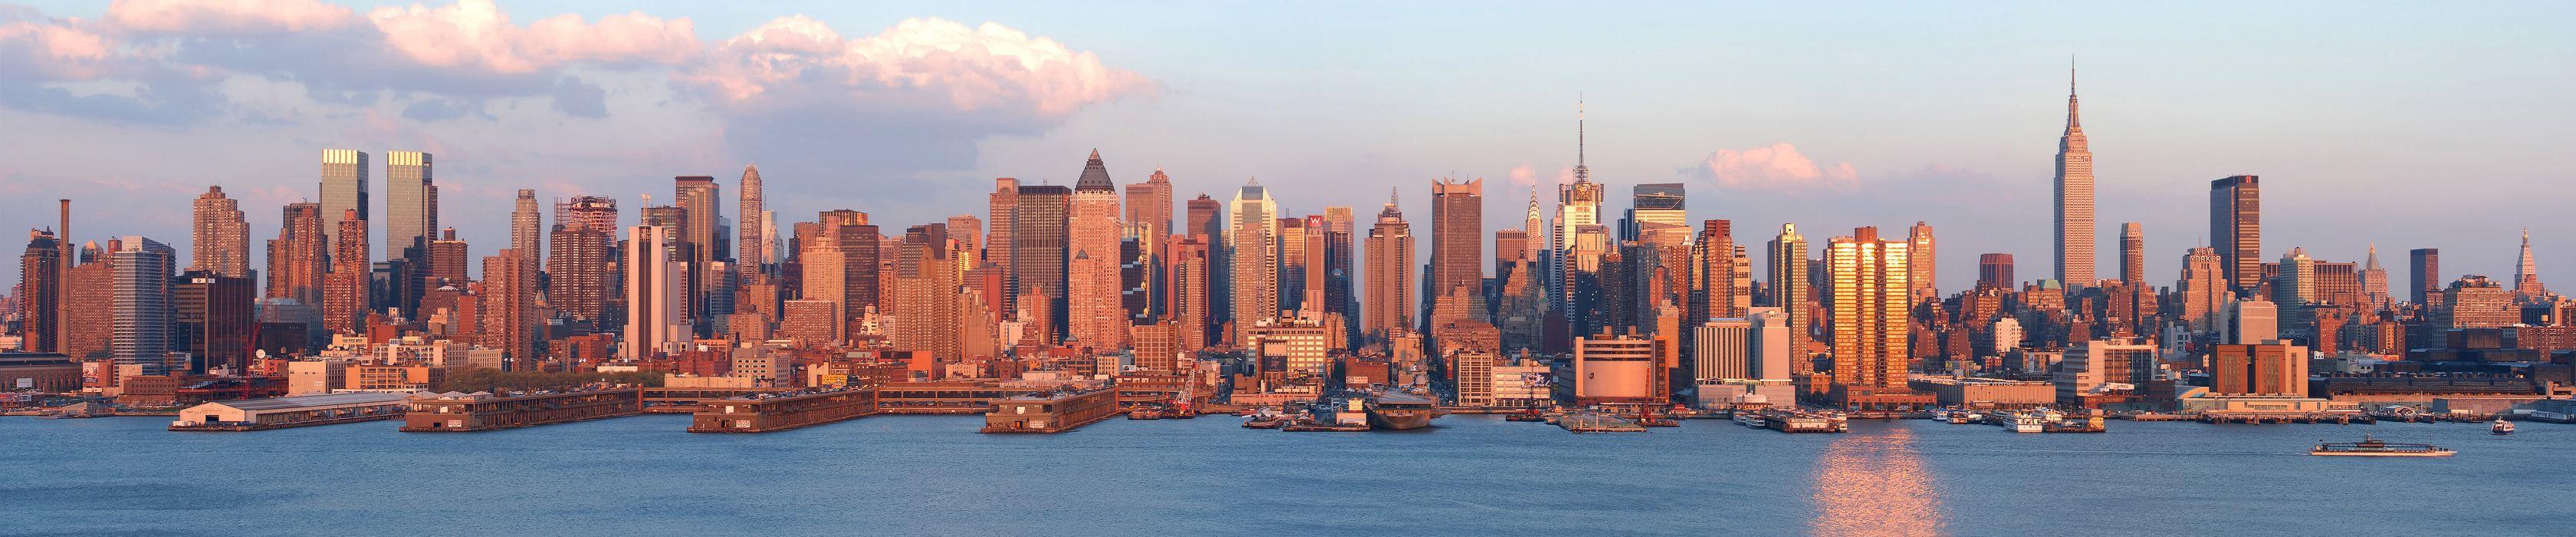 New York Manhattan    j wallpaper